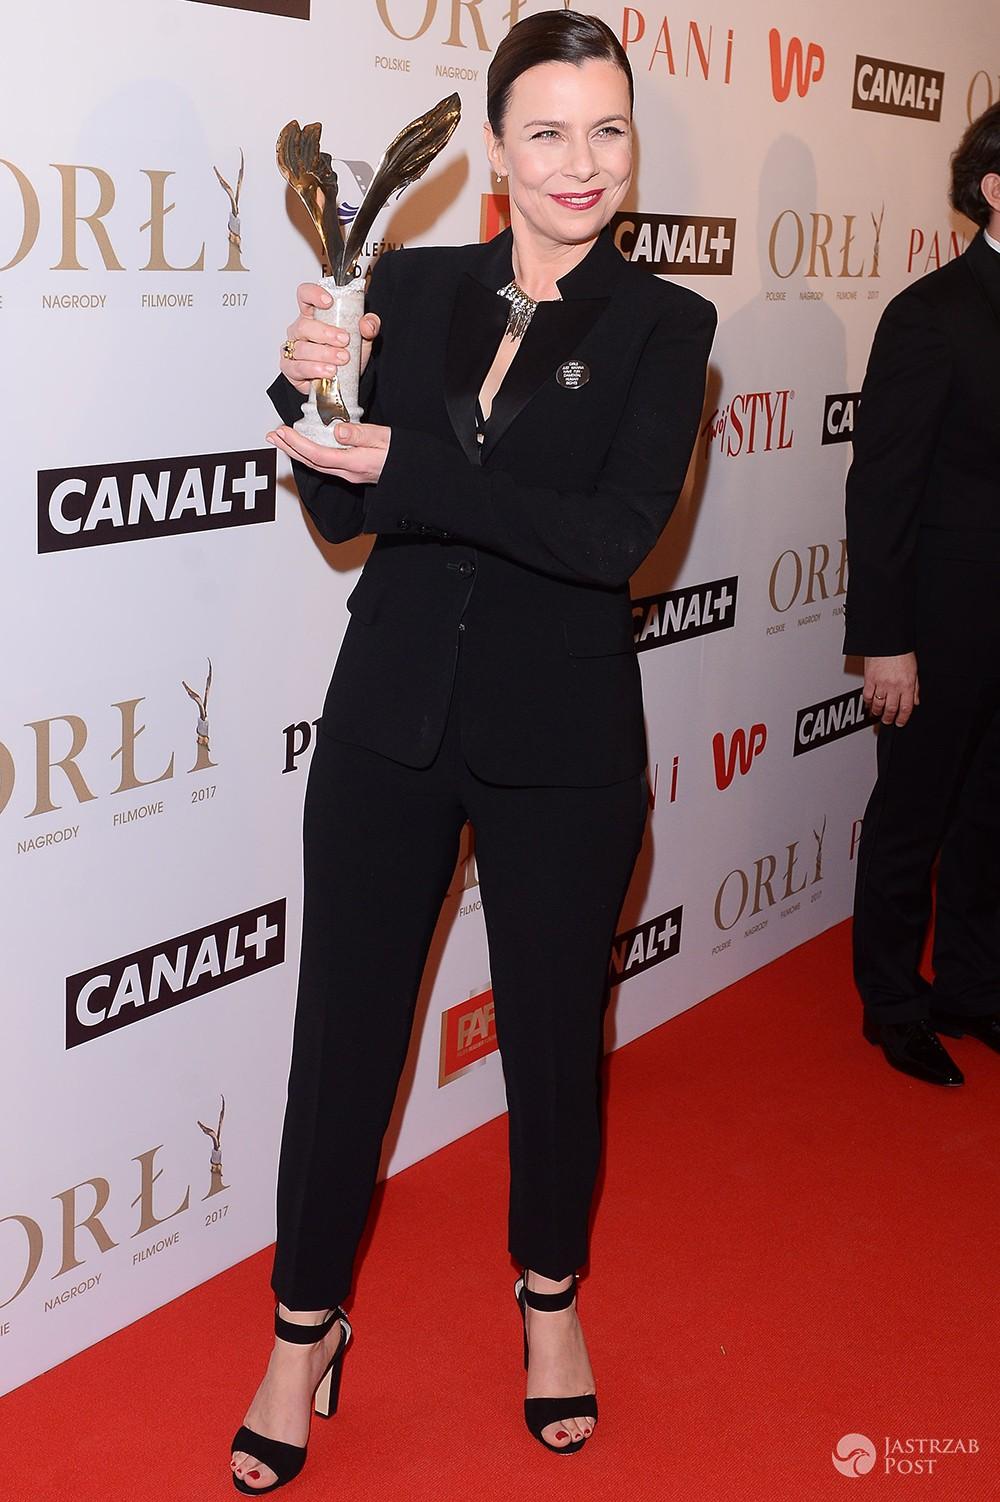 Agata Kulesza z nagrodą Orły 2017